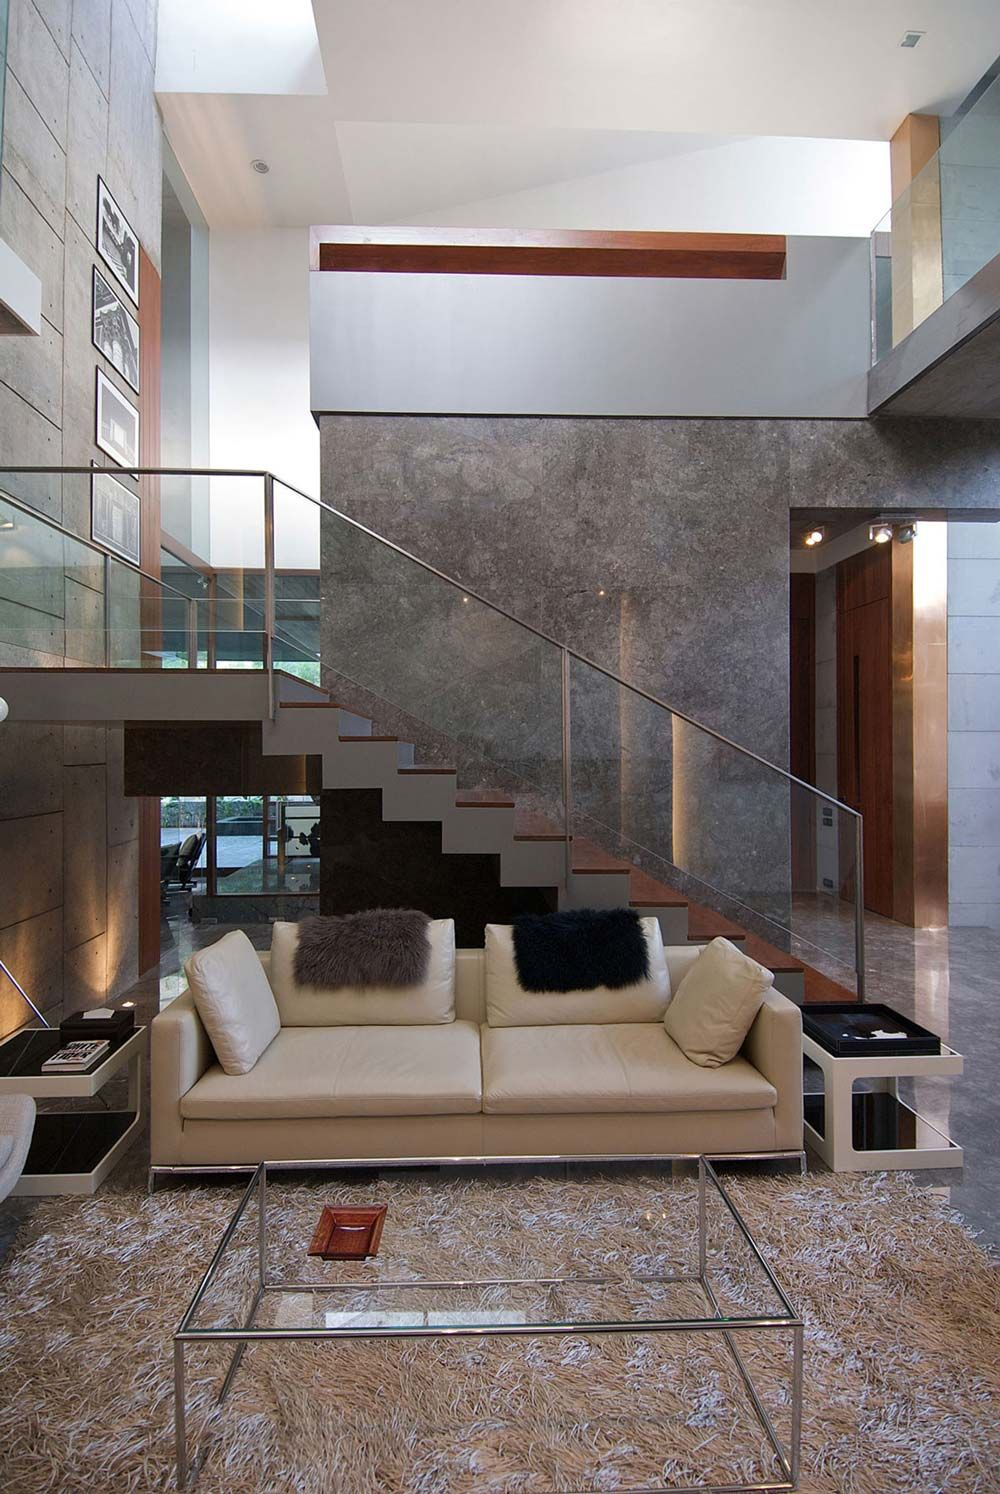 marble walls, stairs, poona house in mumbai, indiarajiv saini